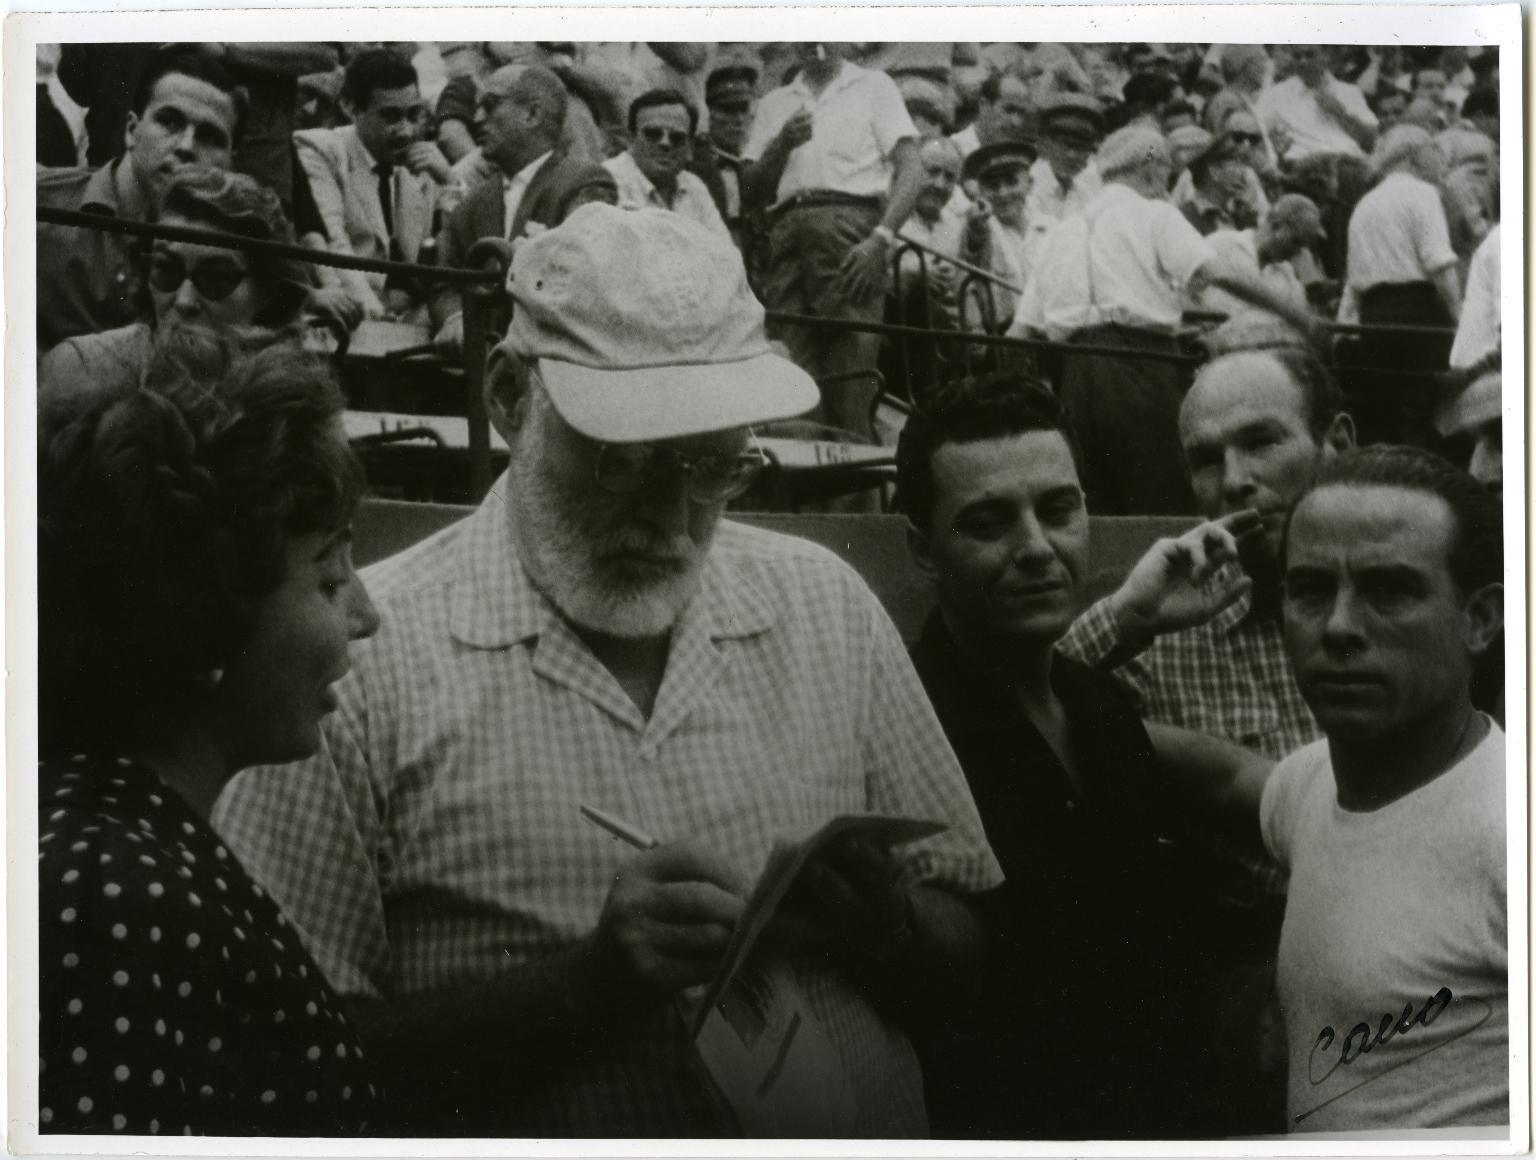 Hemingway Writing at Bullfight